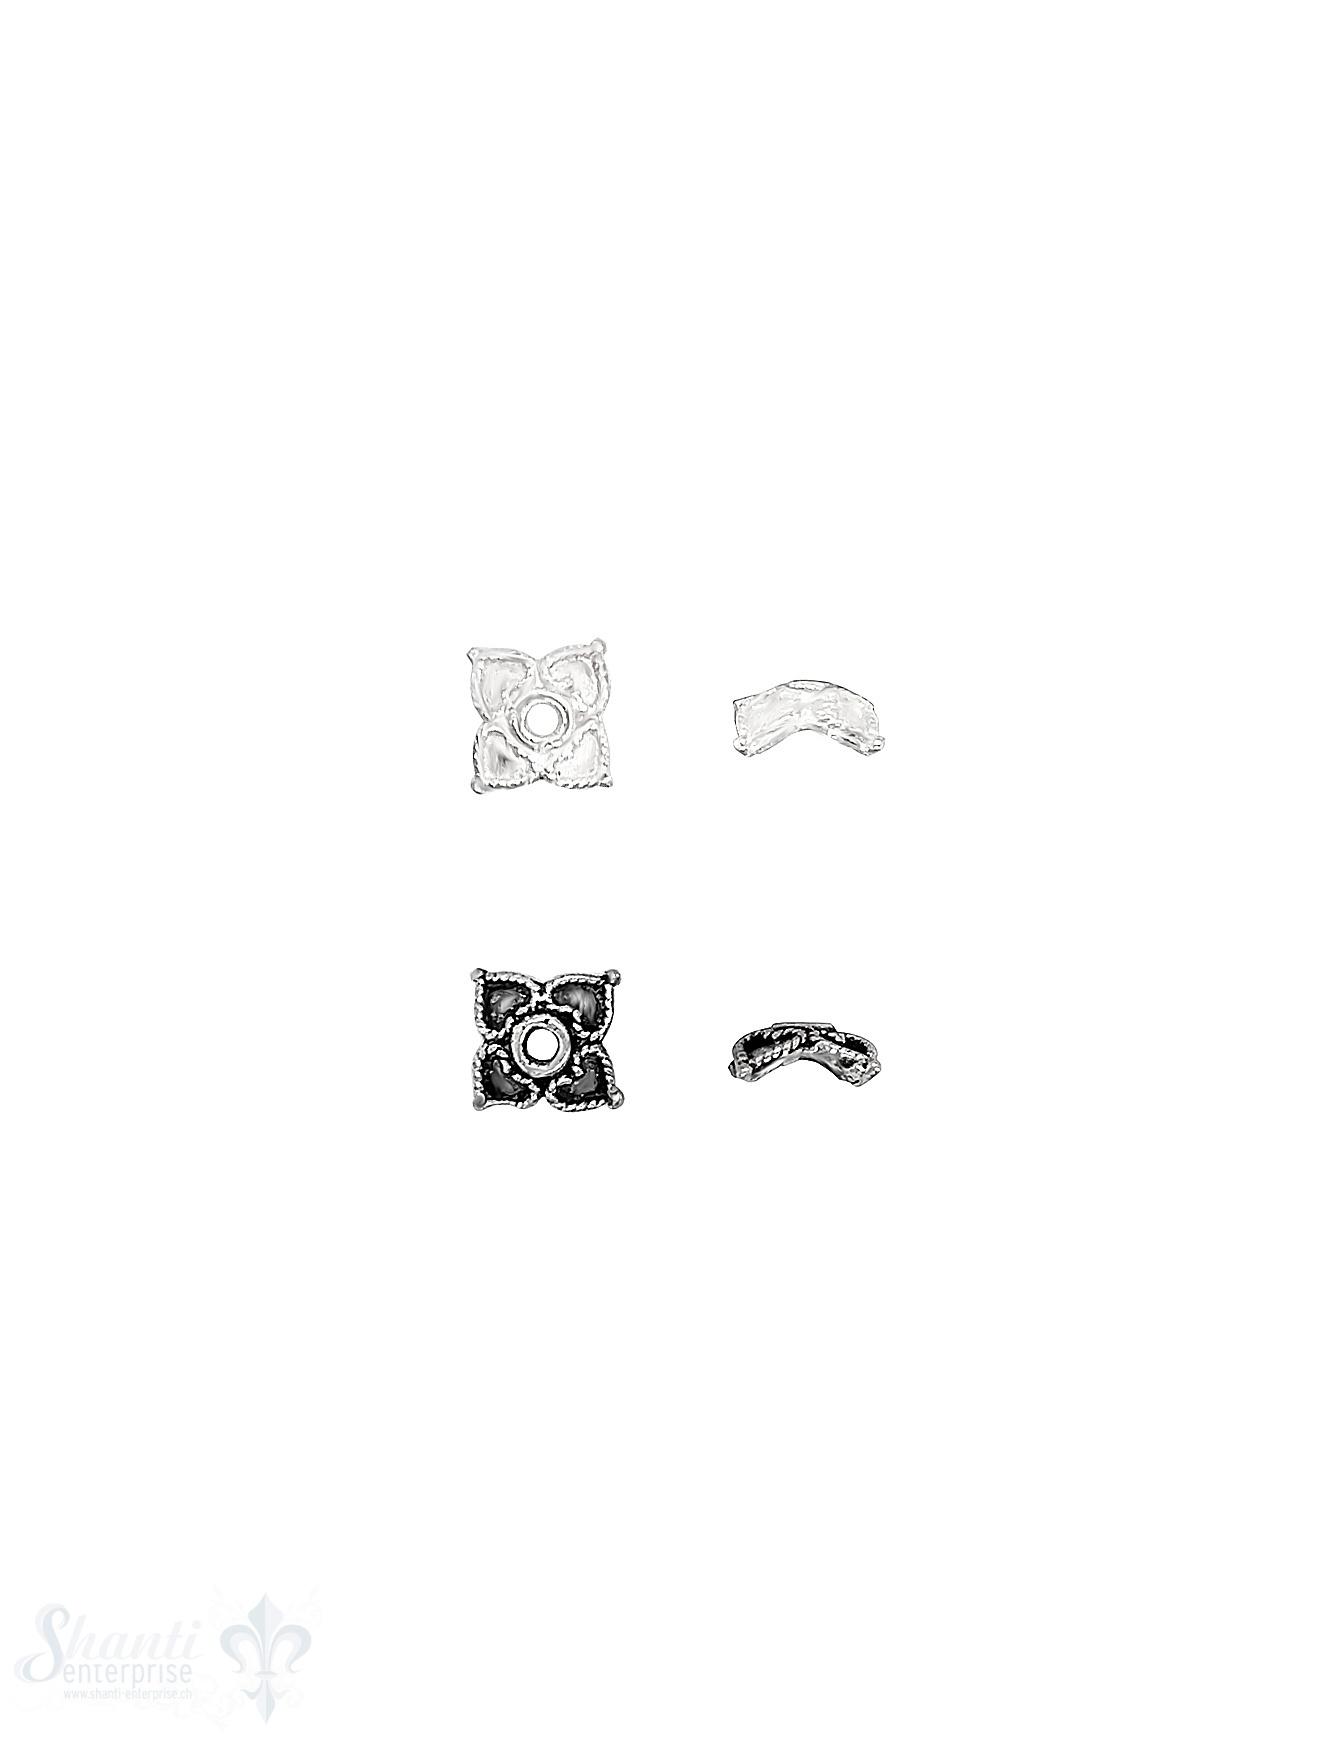 Blüten Perlkappe 9x2,6 mm 4-blättrig verziert mit Rand Silber 925 ID 1.2 mm 1 Pack = 18 Stk. ca. 5 gr.